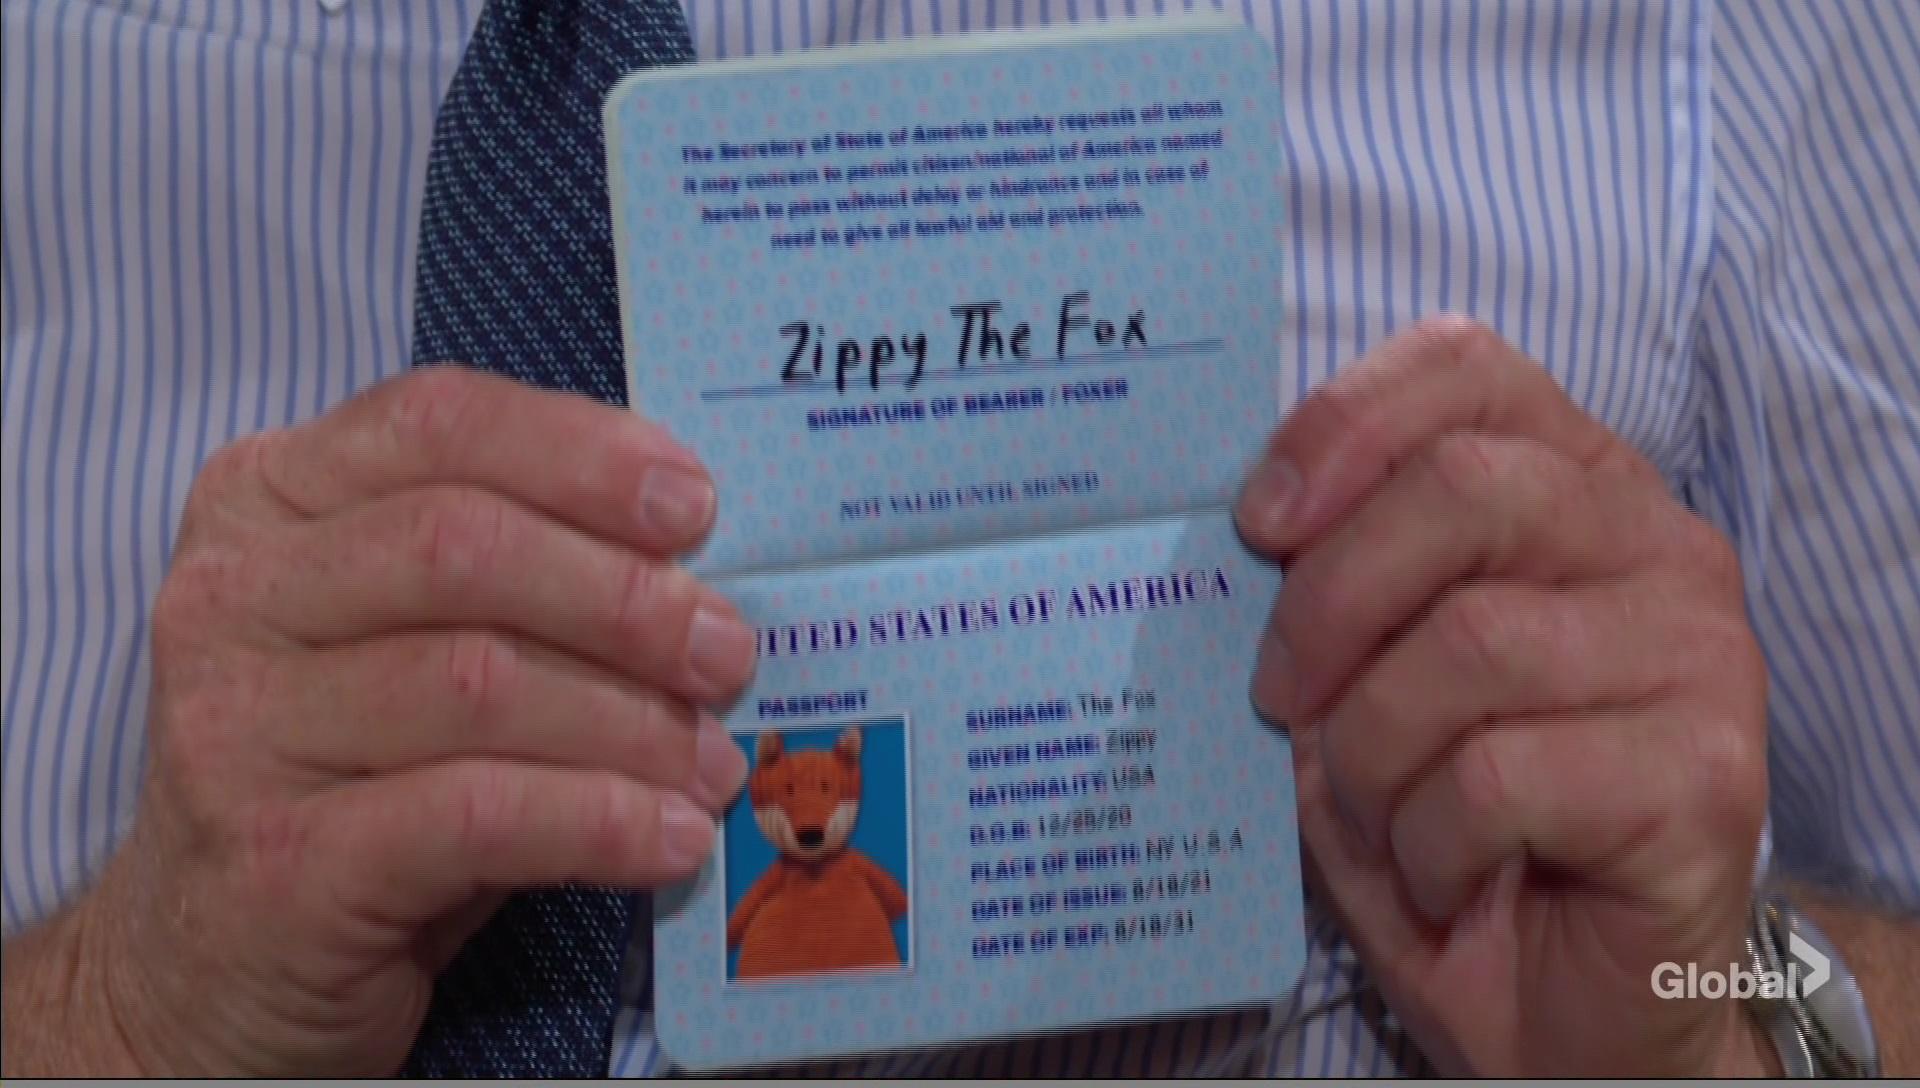 zippy harrison fox passport young and restless